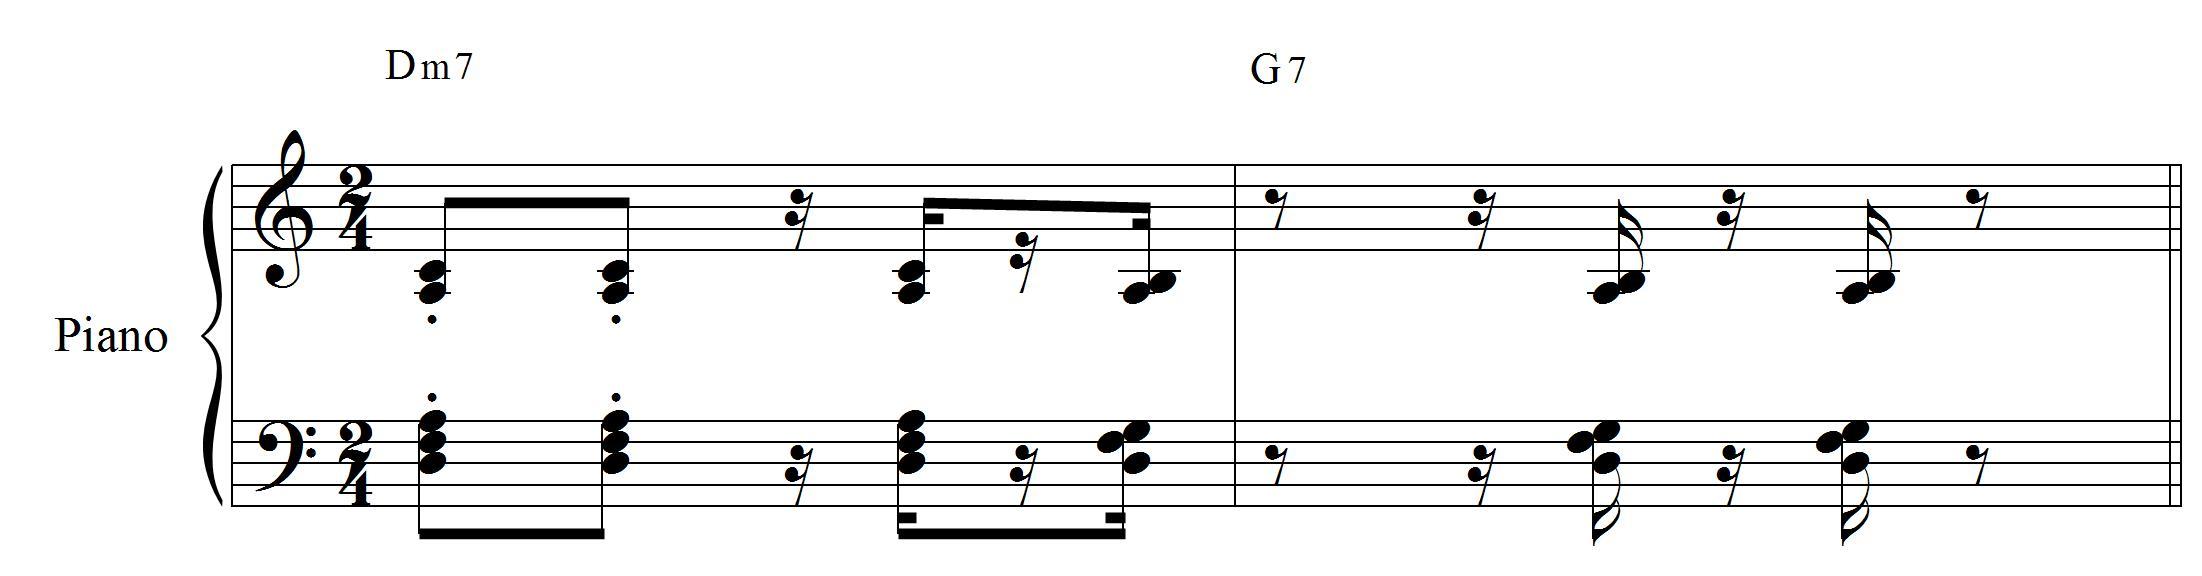 Piano tradicional